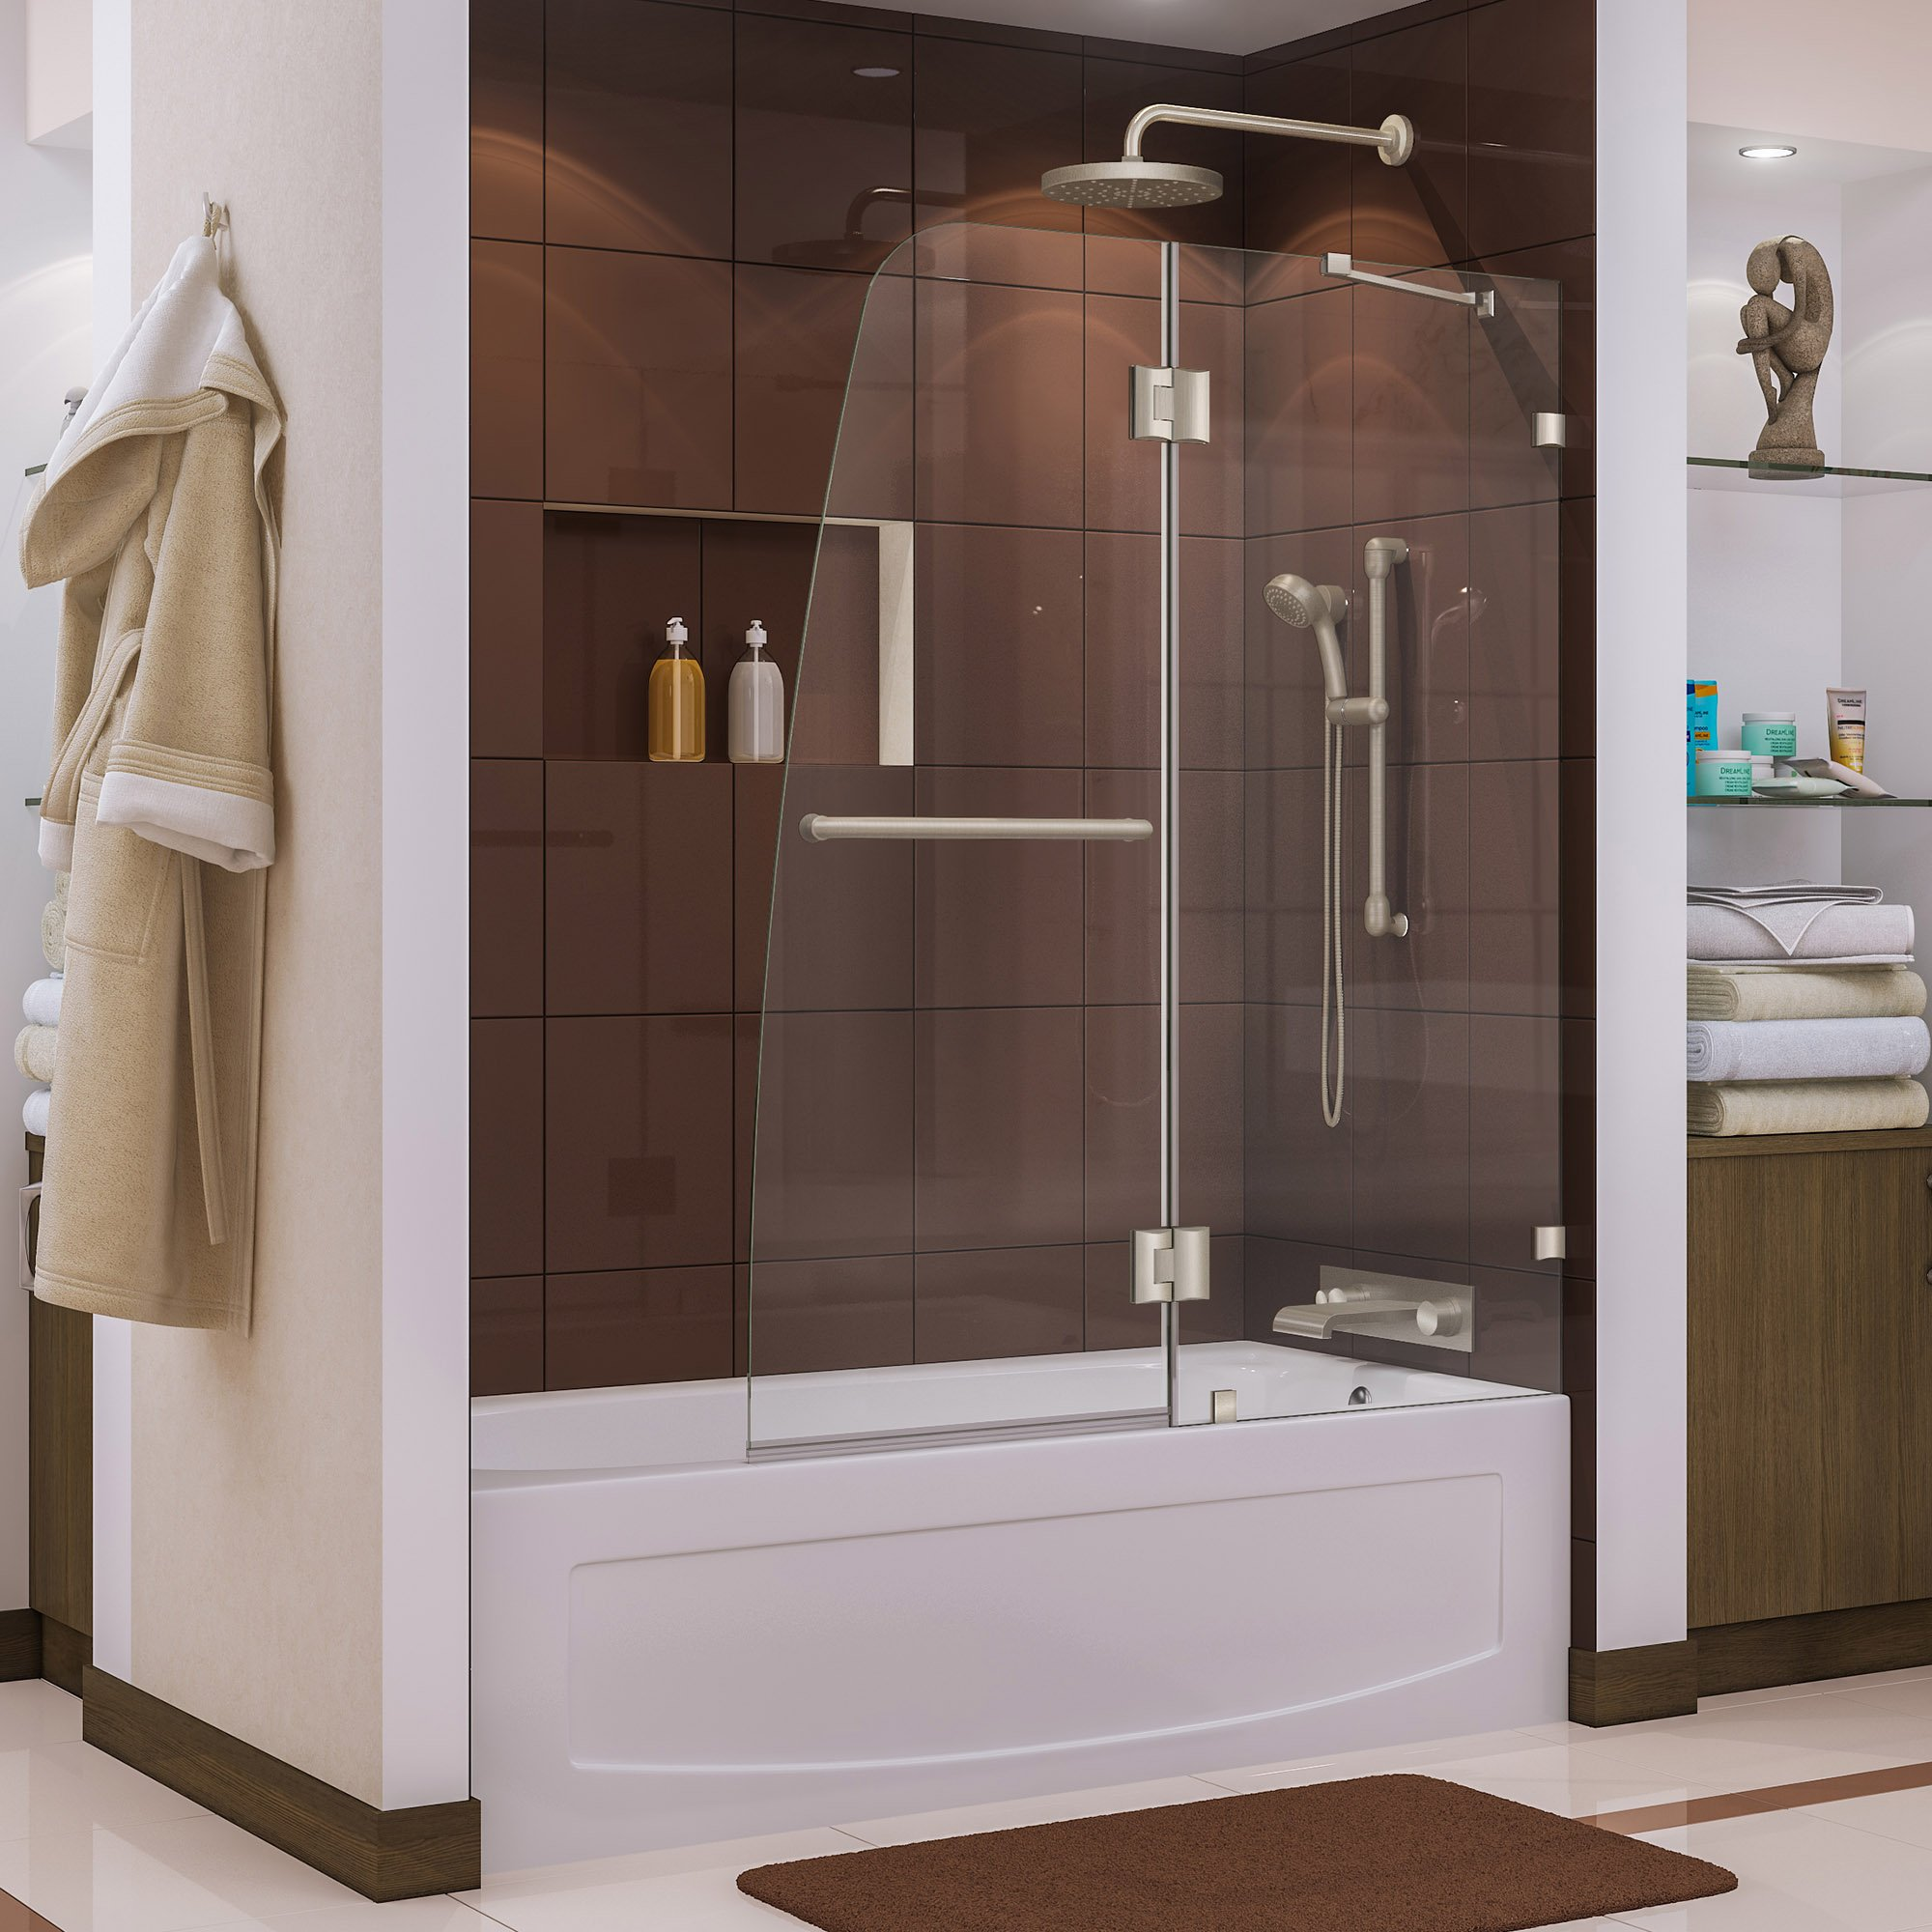 DreamLine Aqua Lux 48 in. Width, Frameless Hinged Tub Door, 5/16'' Glass, Brushed Nickel Finish